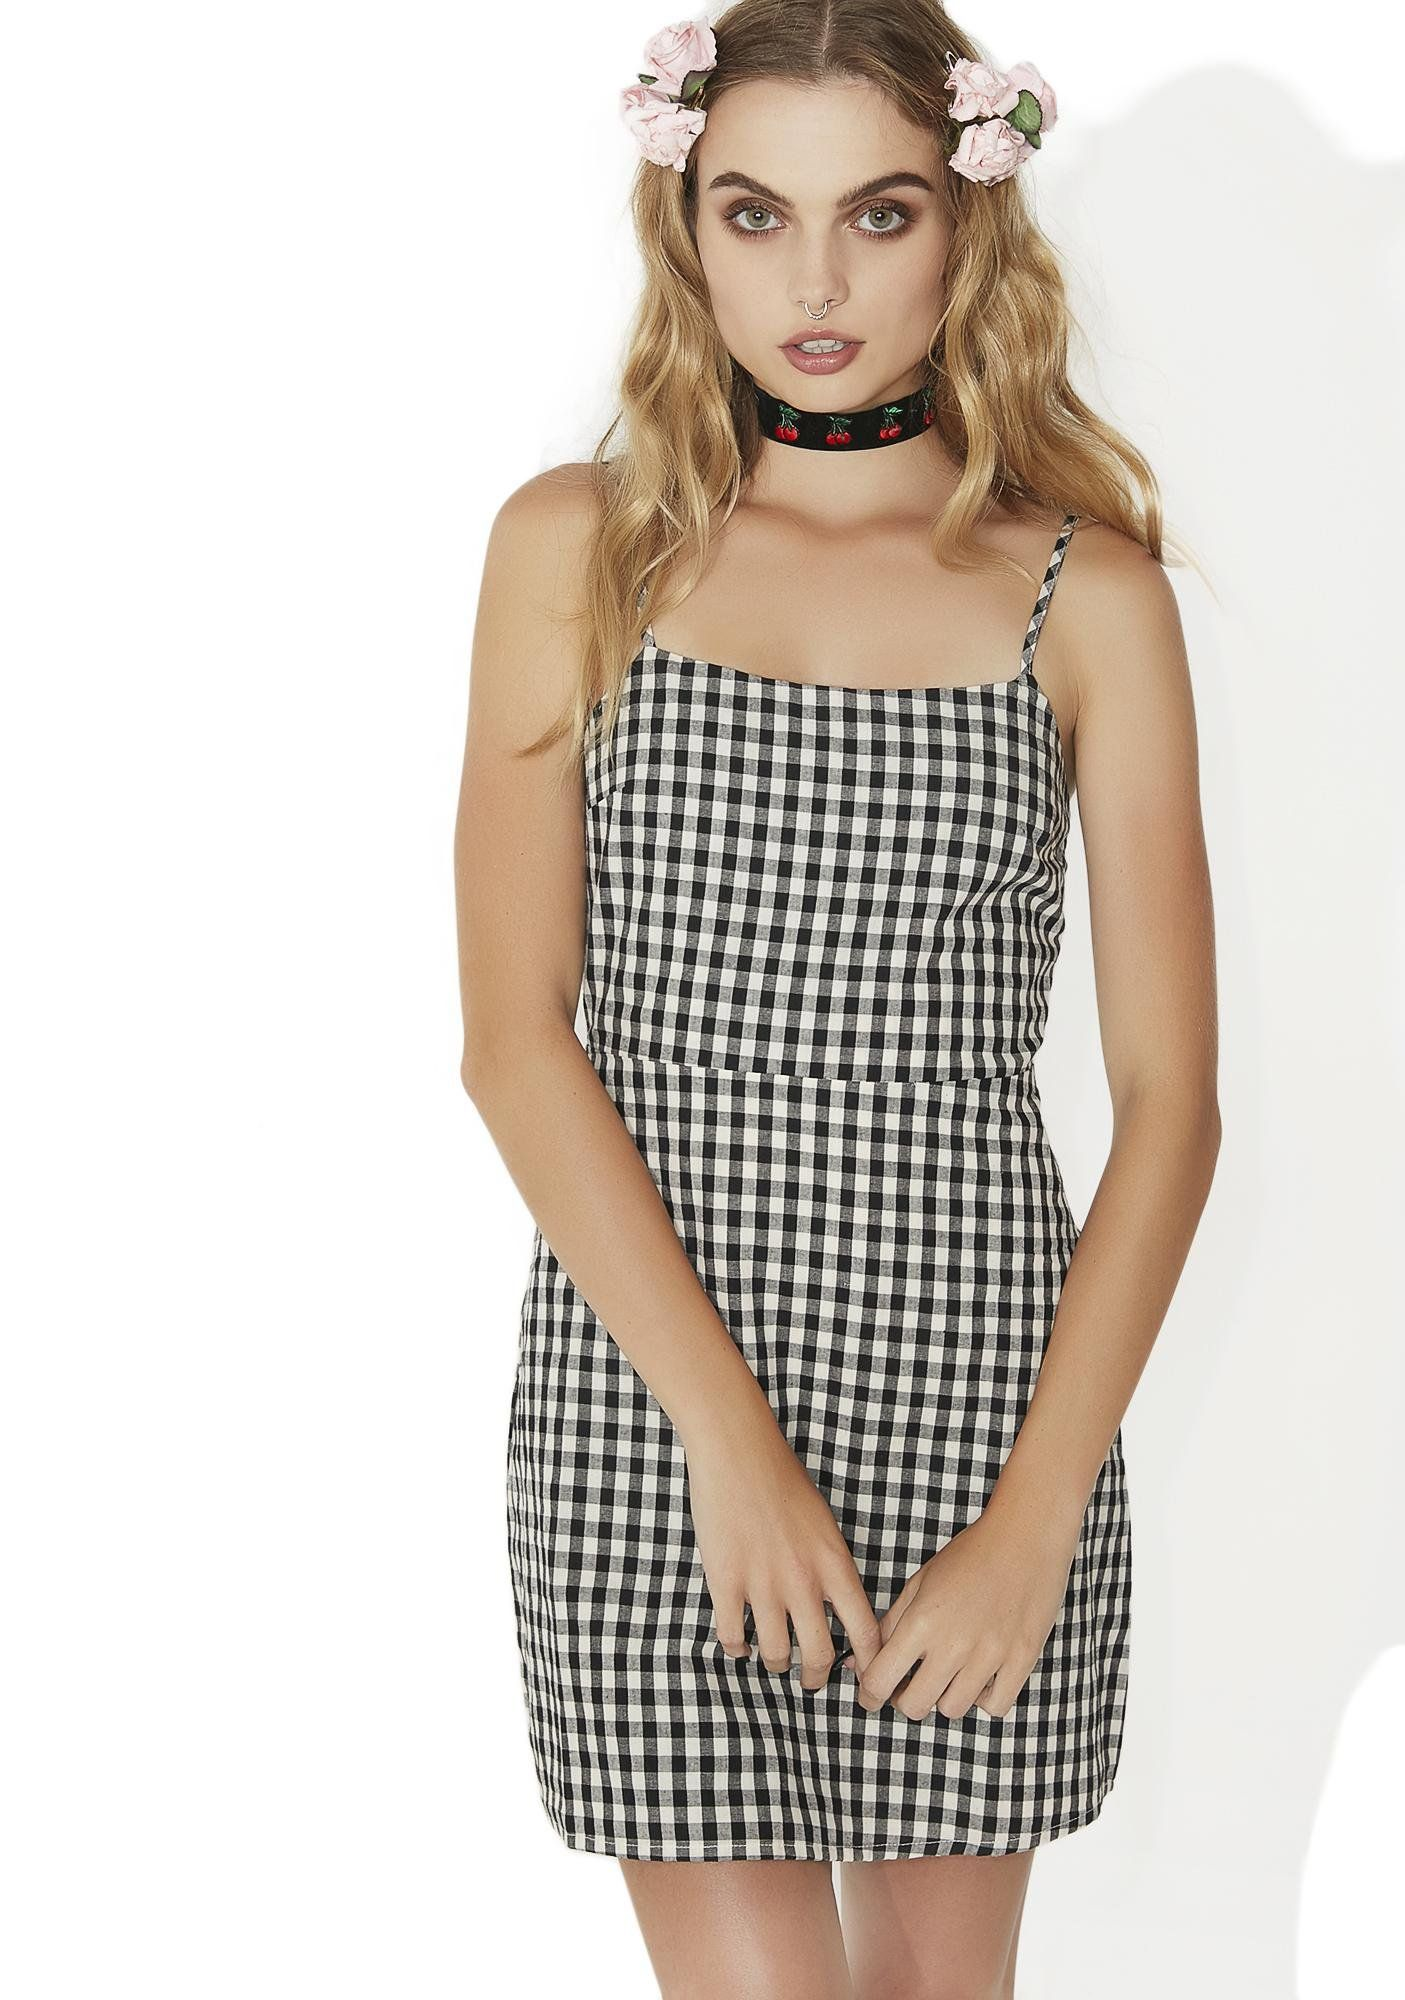 e59955bdbea7 Totally Buggin' Checkered Mini Dress will give ya those Clueless vibez...but